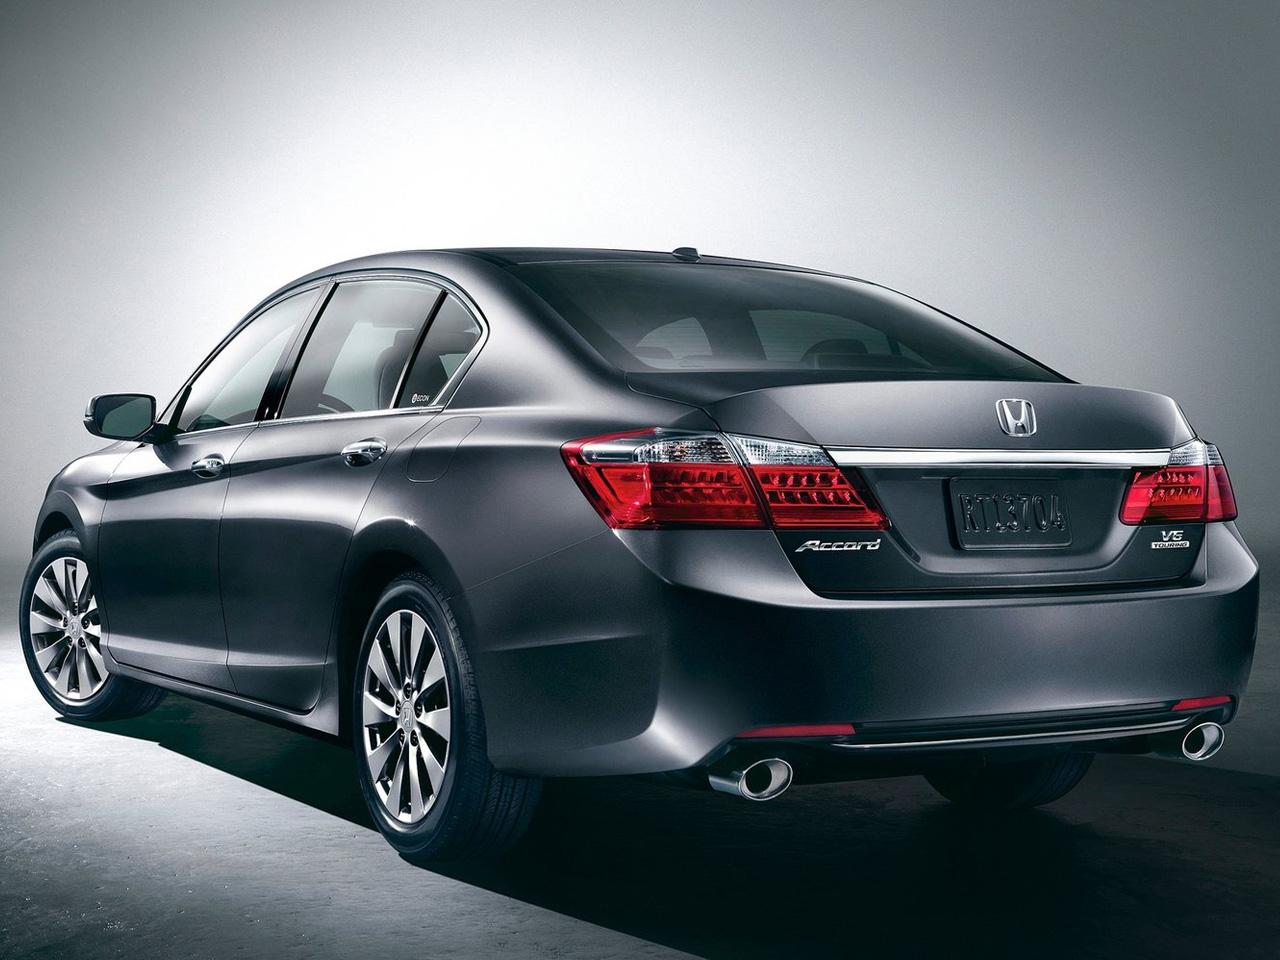 Honda Accord Coupe Specs: 2013 Honda Accord Sedan Specs And Price Latest